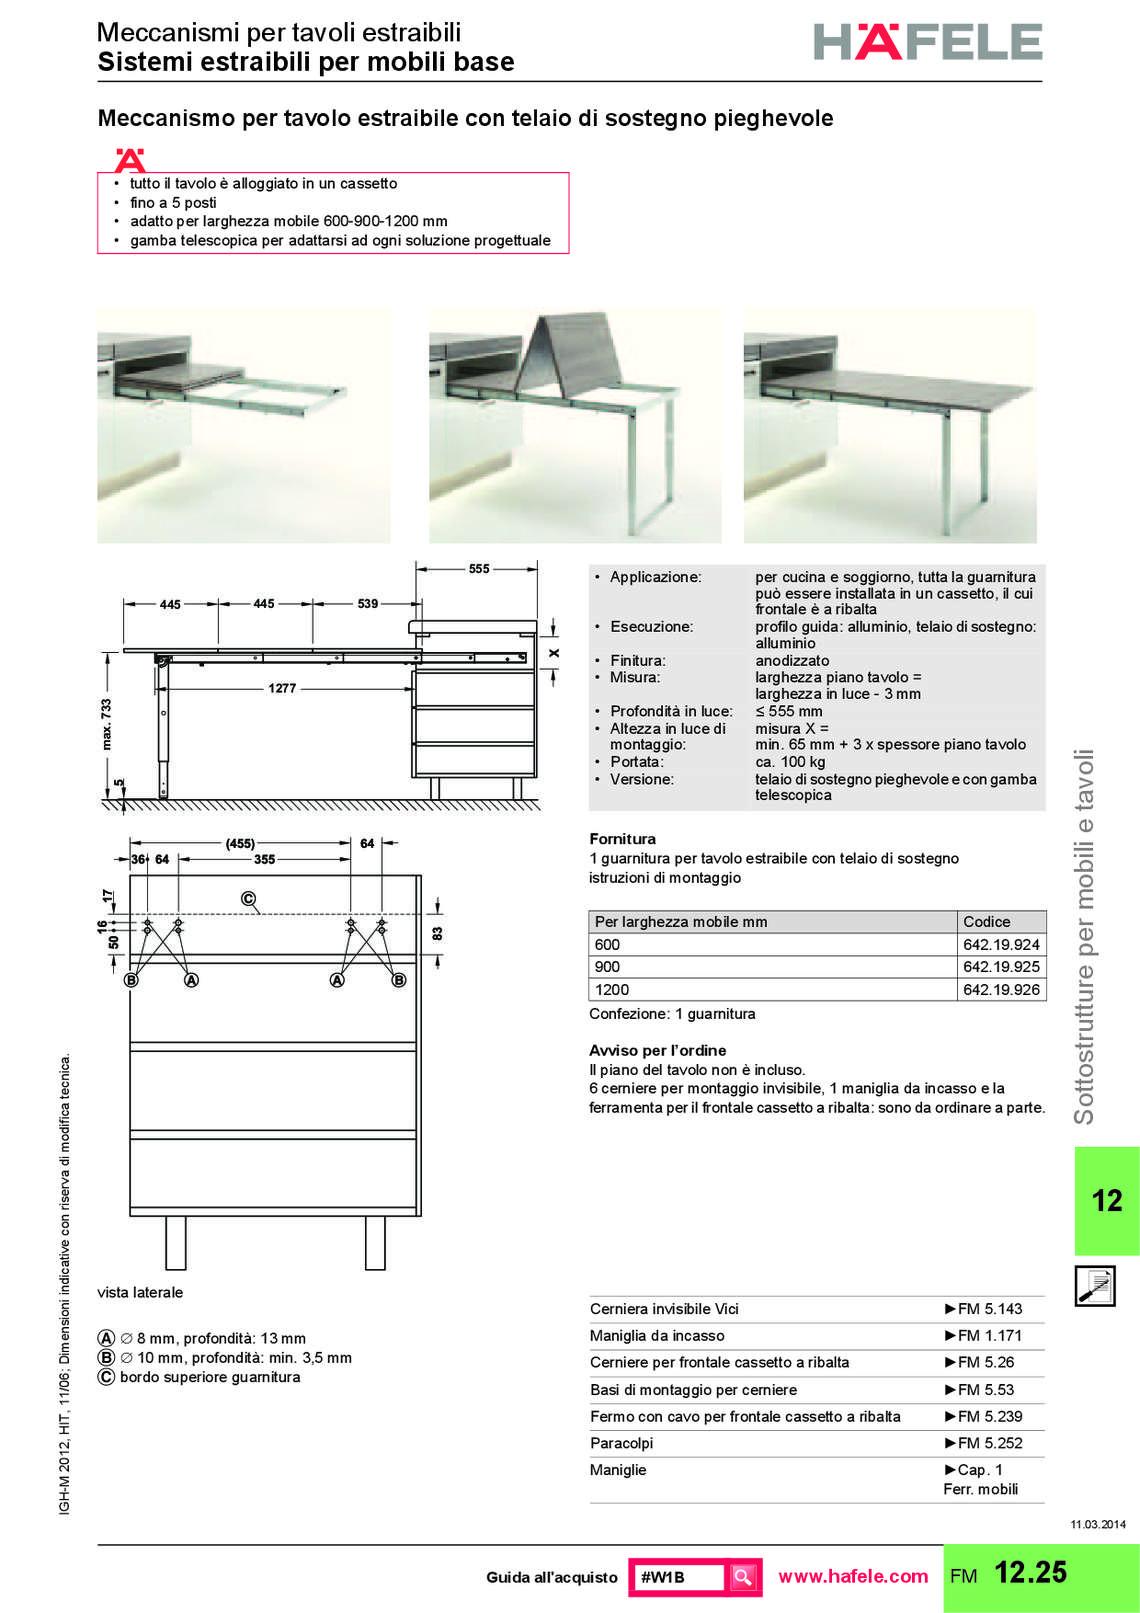 hafele-sottostrutture-per-mobili_83_044.jpg